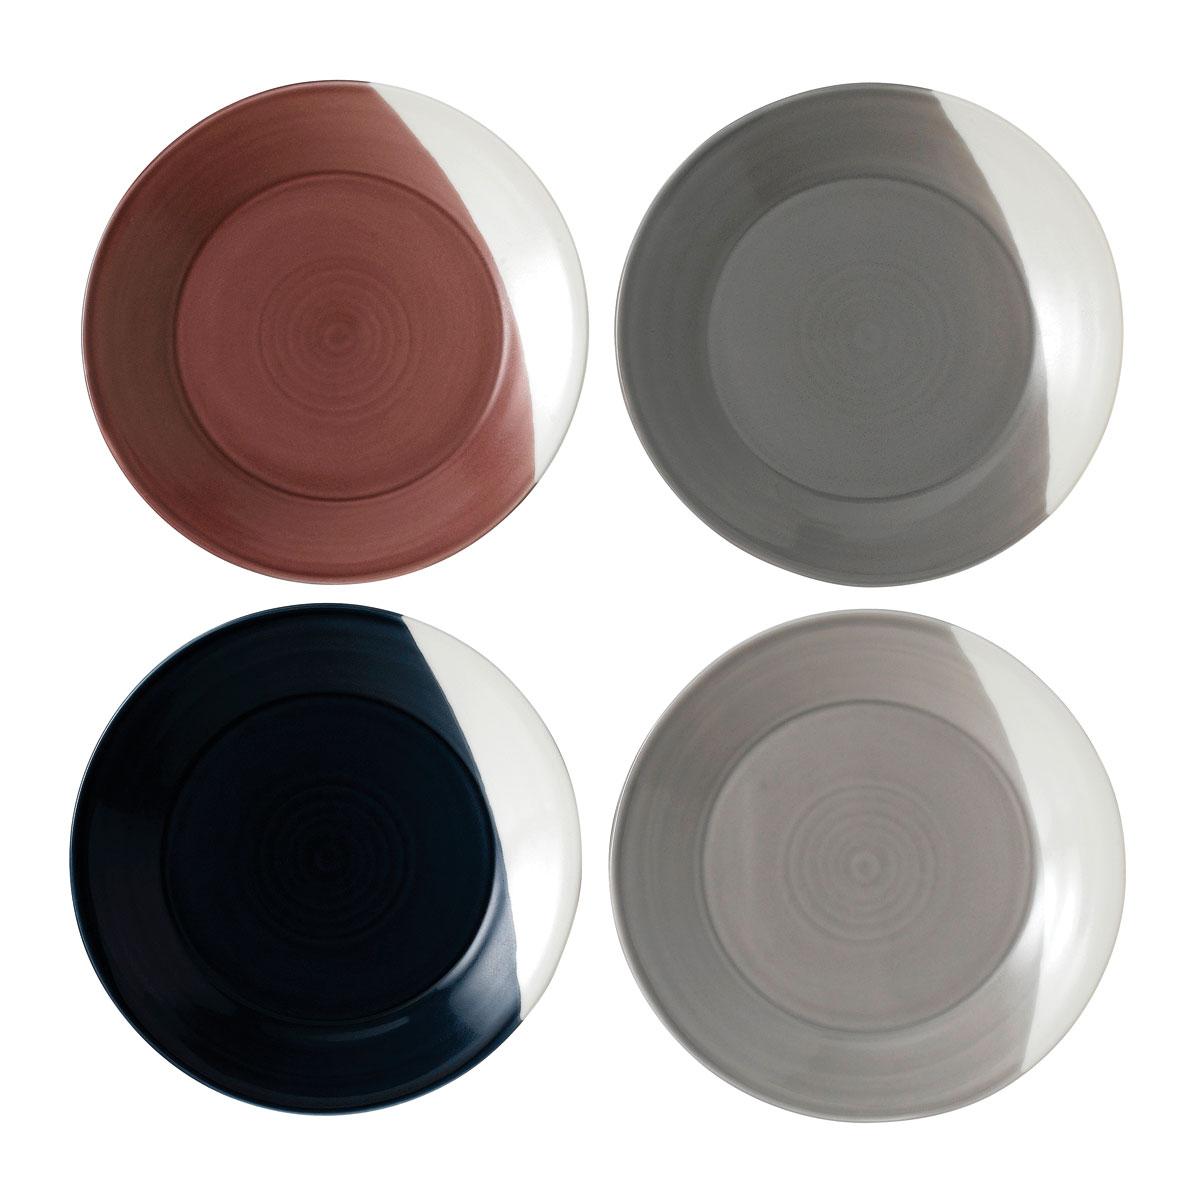 "Royal Doulton Bowls Of Plenty Plate 9.3"" Set of 4"